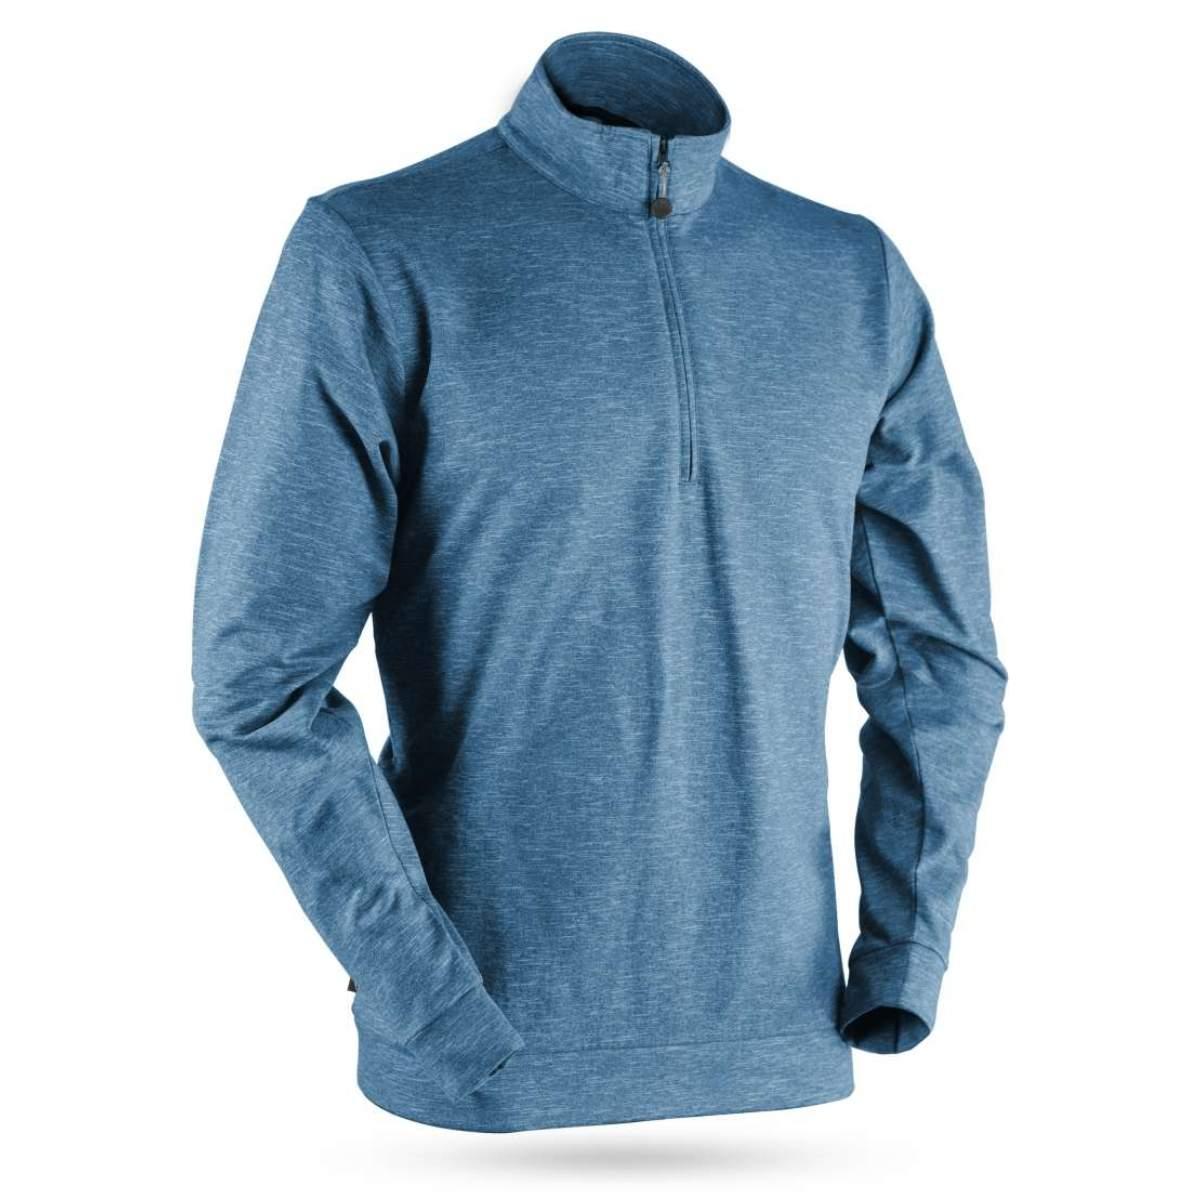 Sun Mountain 2021 Men's Bridger 1/4 Zip Pullover